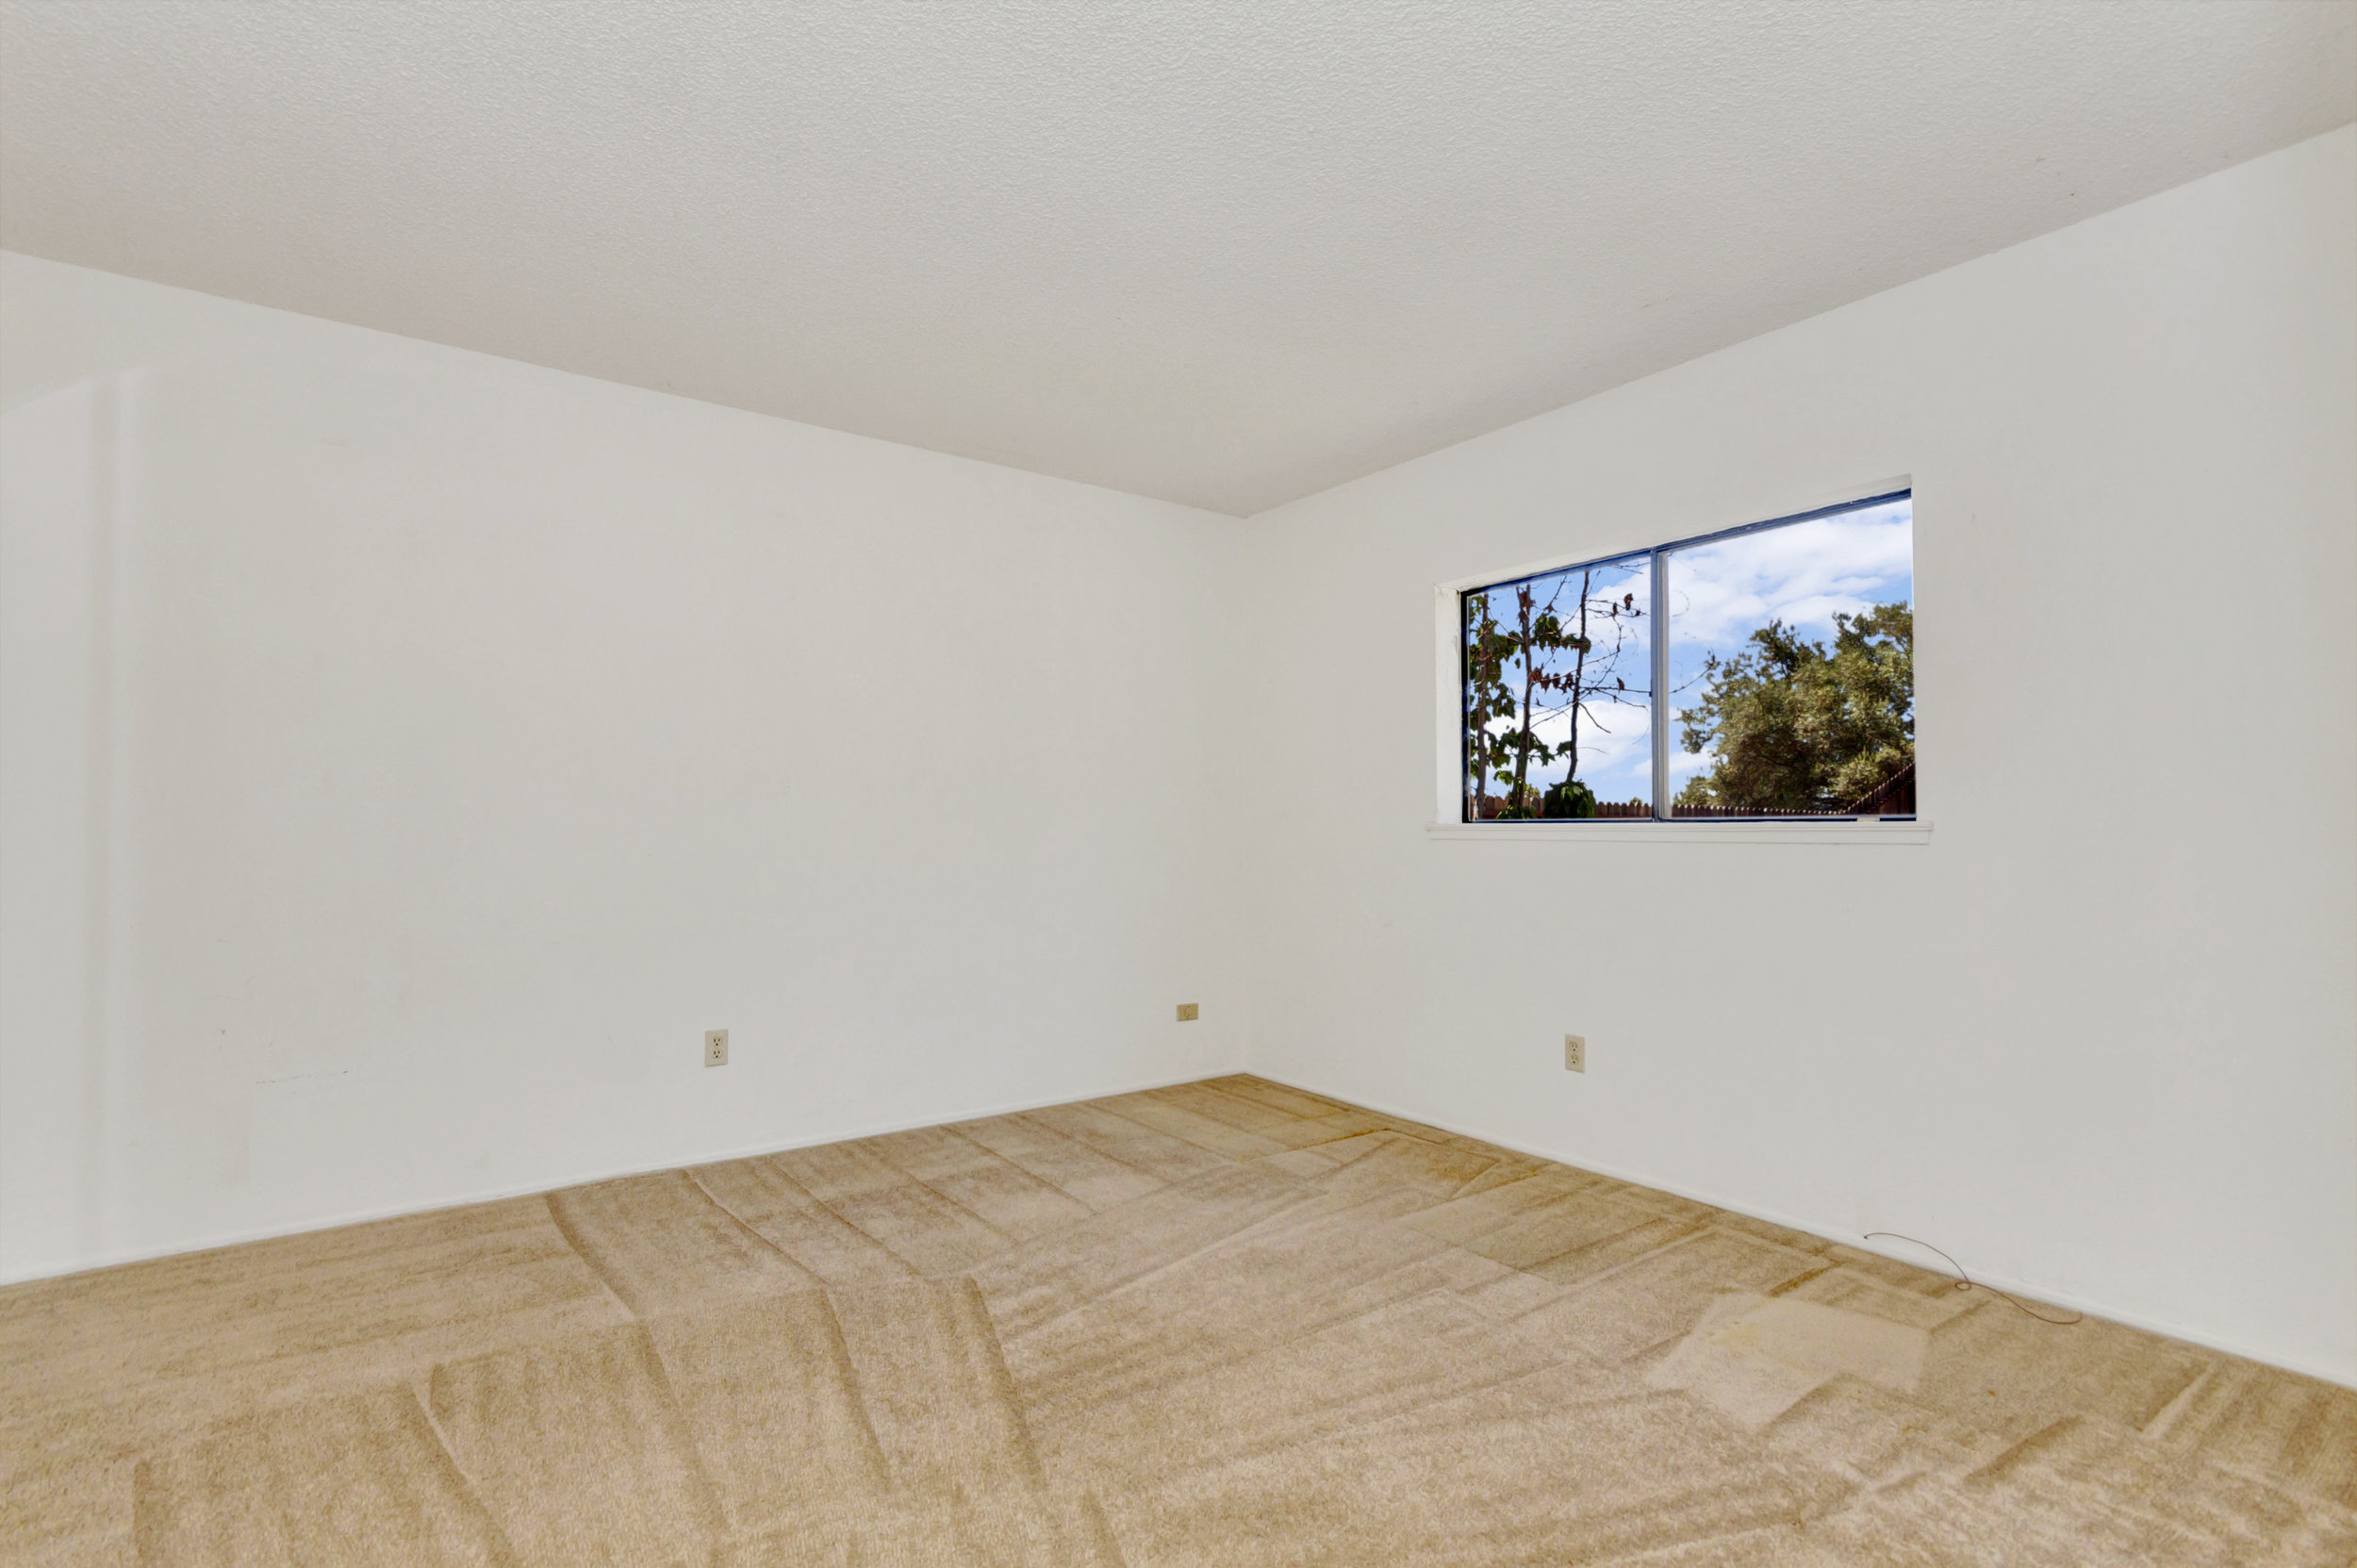 180 E Seaview Dr Benicia CA-print-022-3-Fourth Bedroom 1a-4200x2795-300dpi.jpg